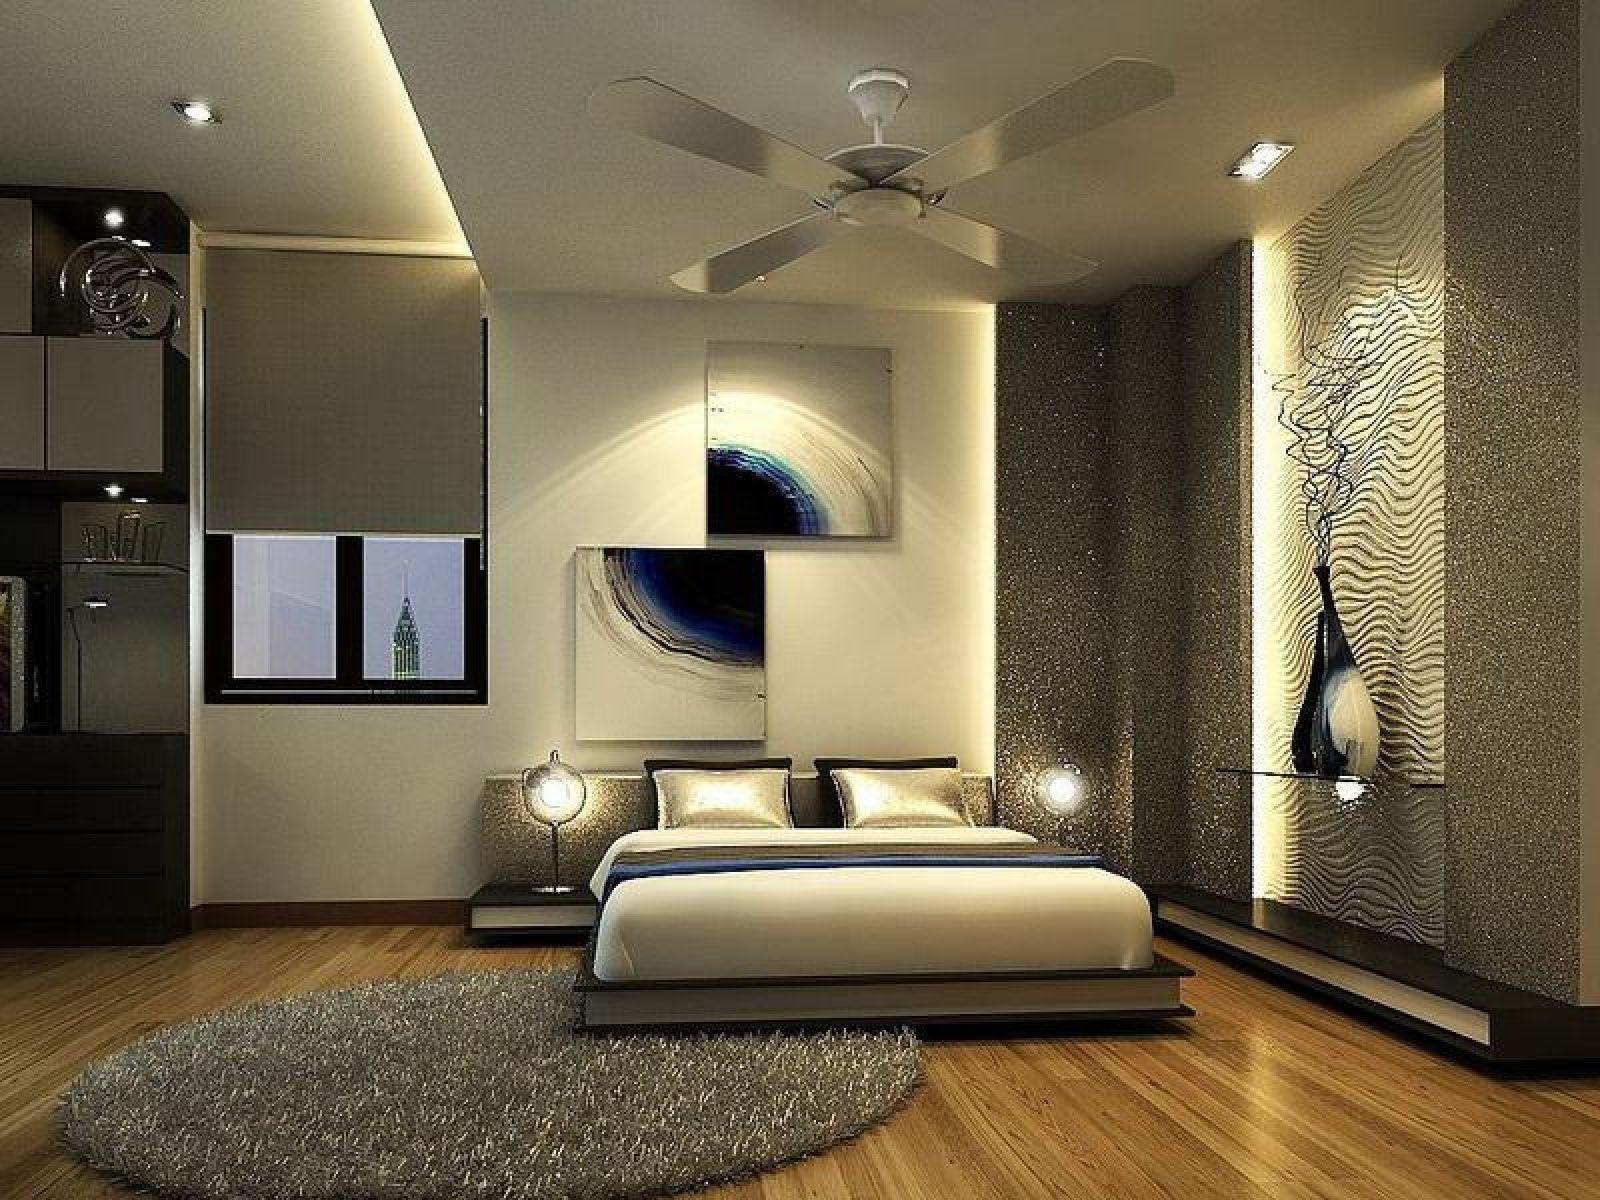 ديكور جبس غرف نوم 2017 2018 Modern Bedroom Interior Contemporary Bedroom Design Cozy Bedroom Design